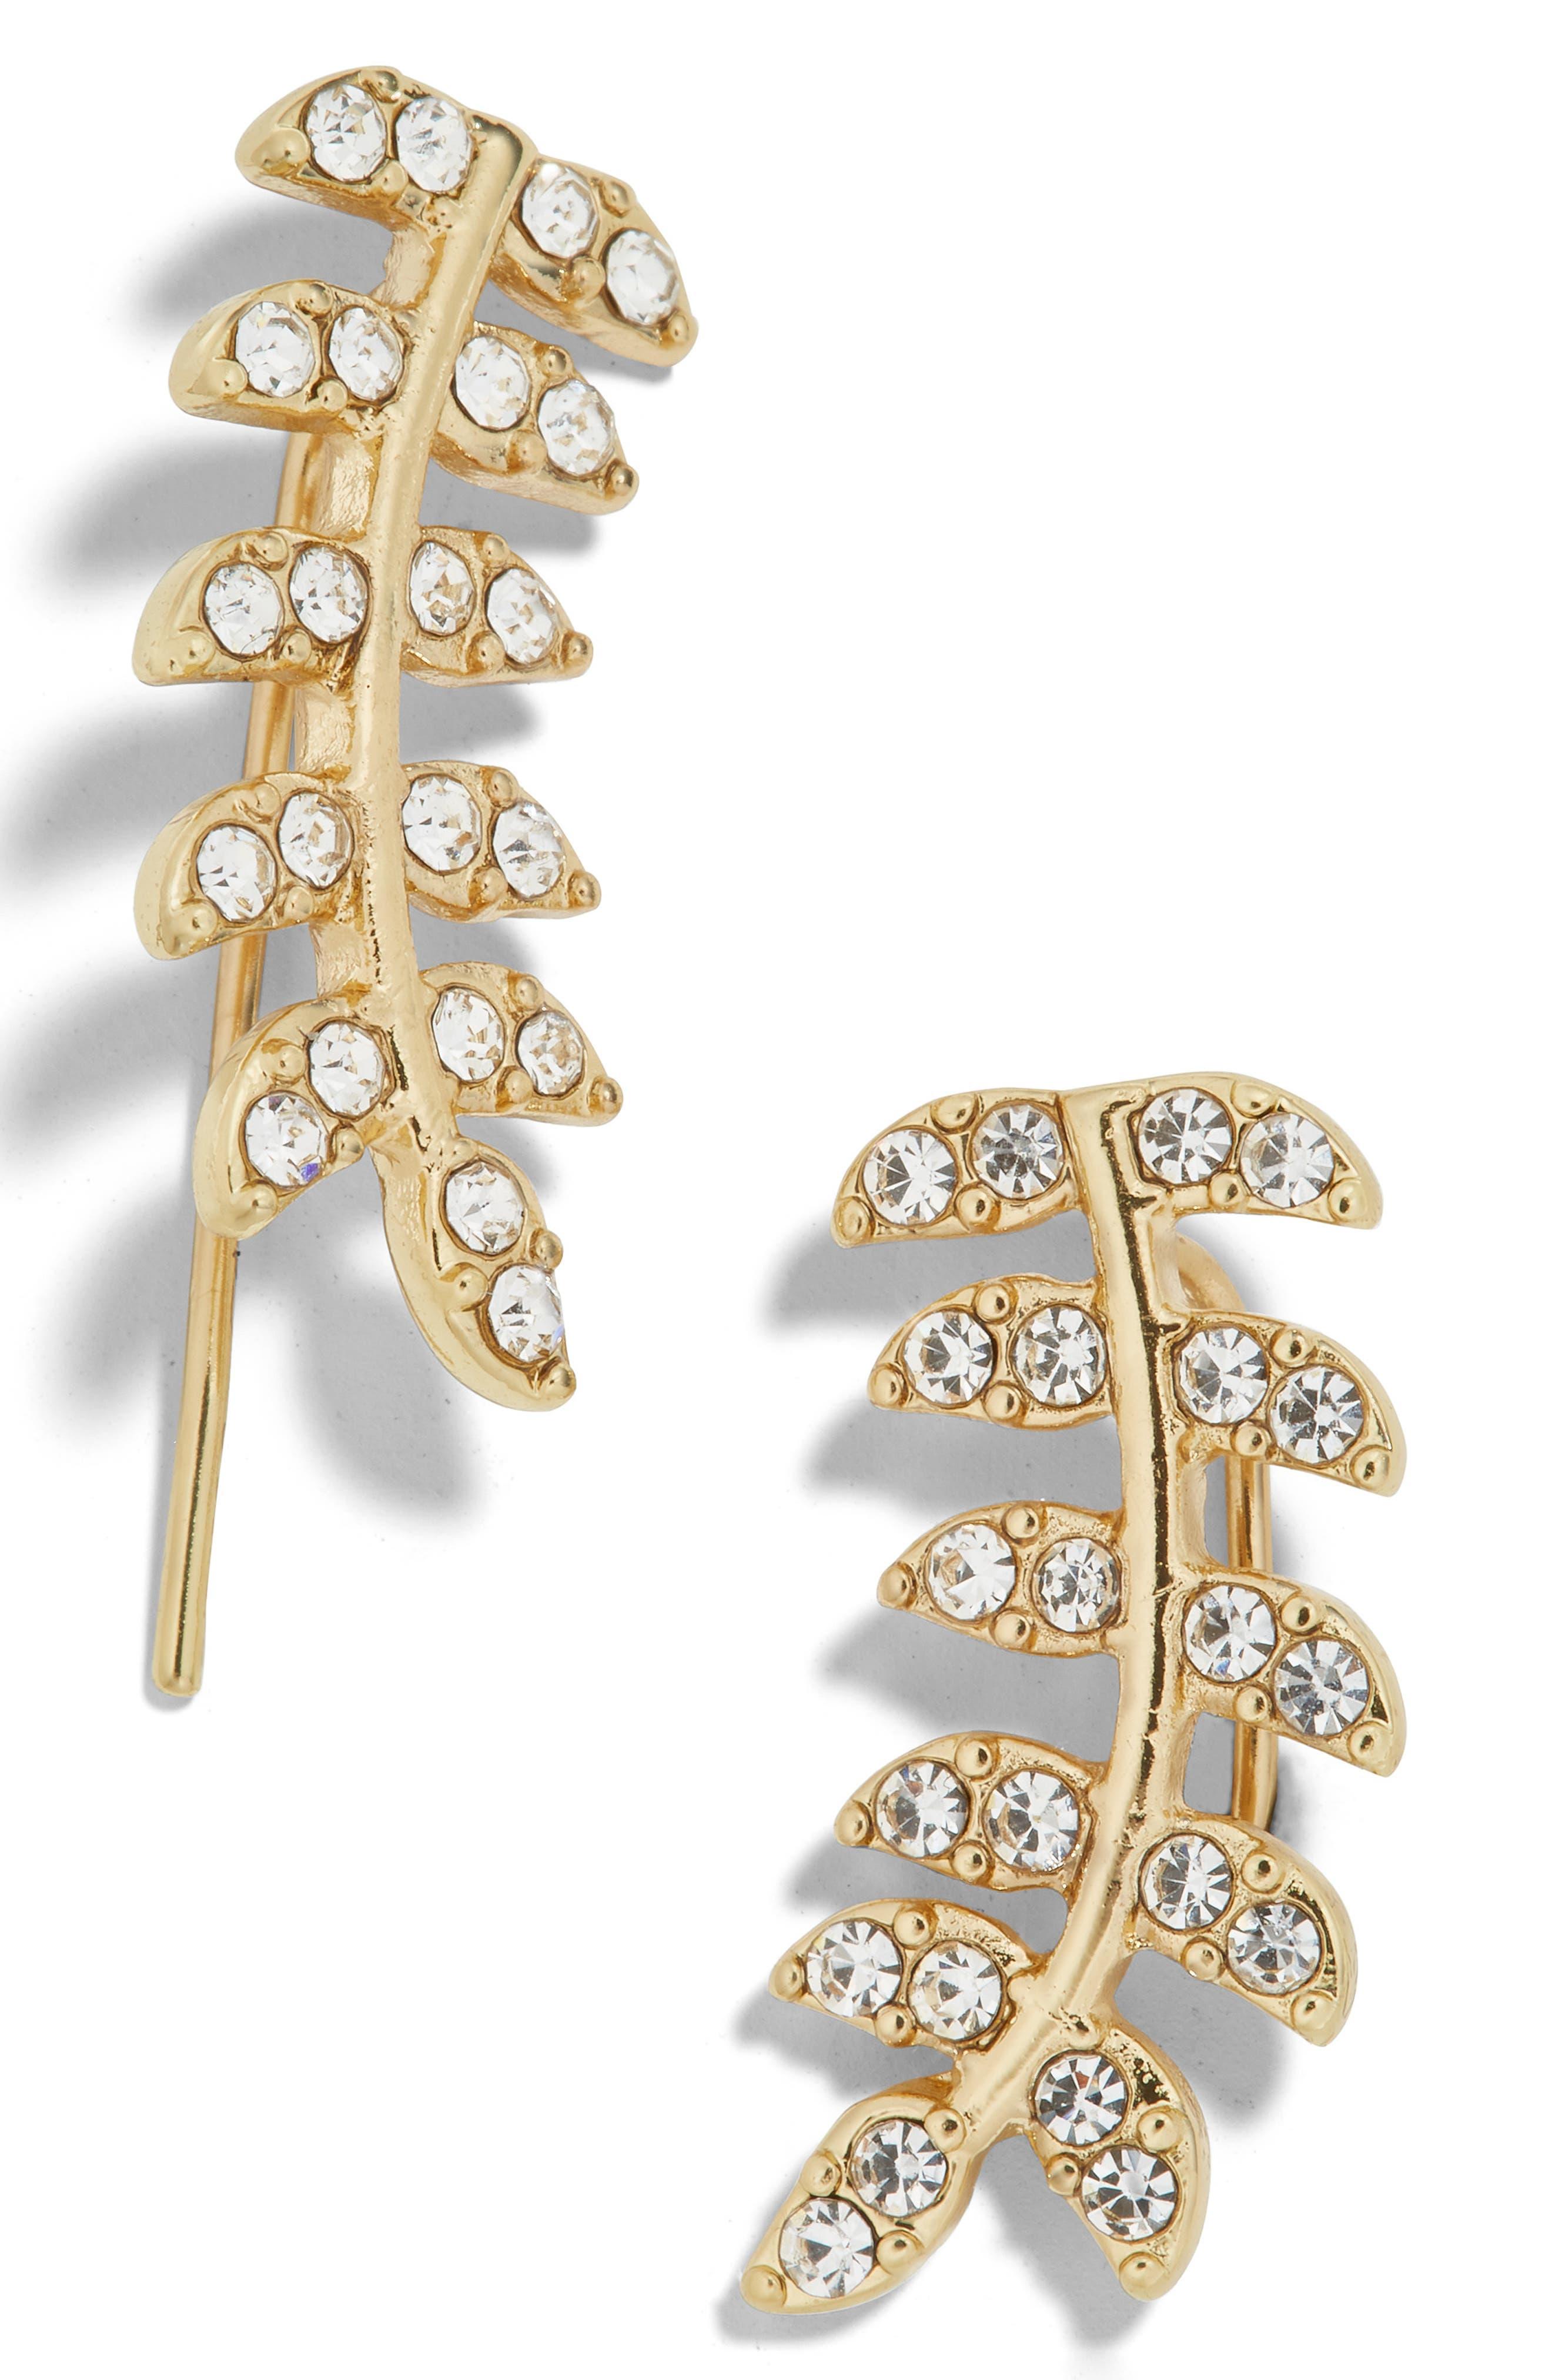 BAUBLEBAR, Vaniya Crystal Leaf Drop Earrings, Main thumbnail 1, color, GOLD